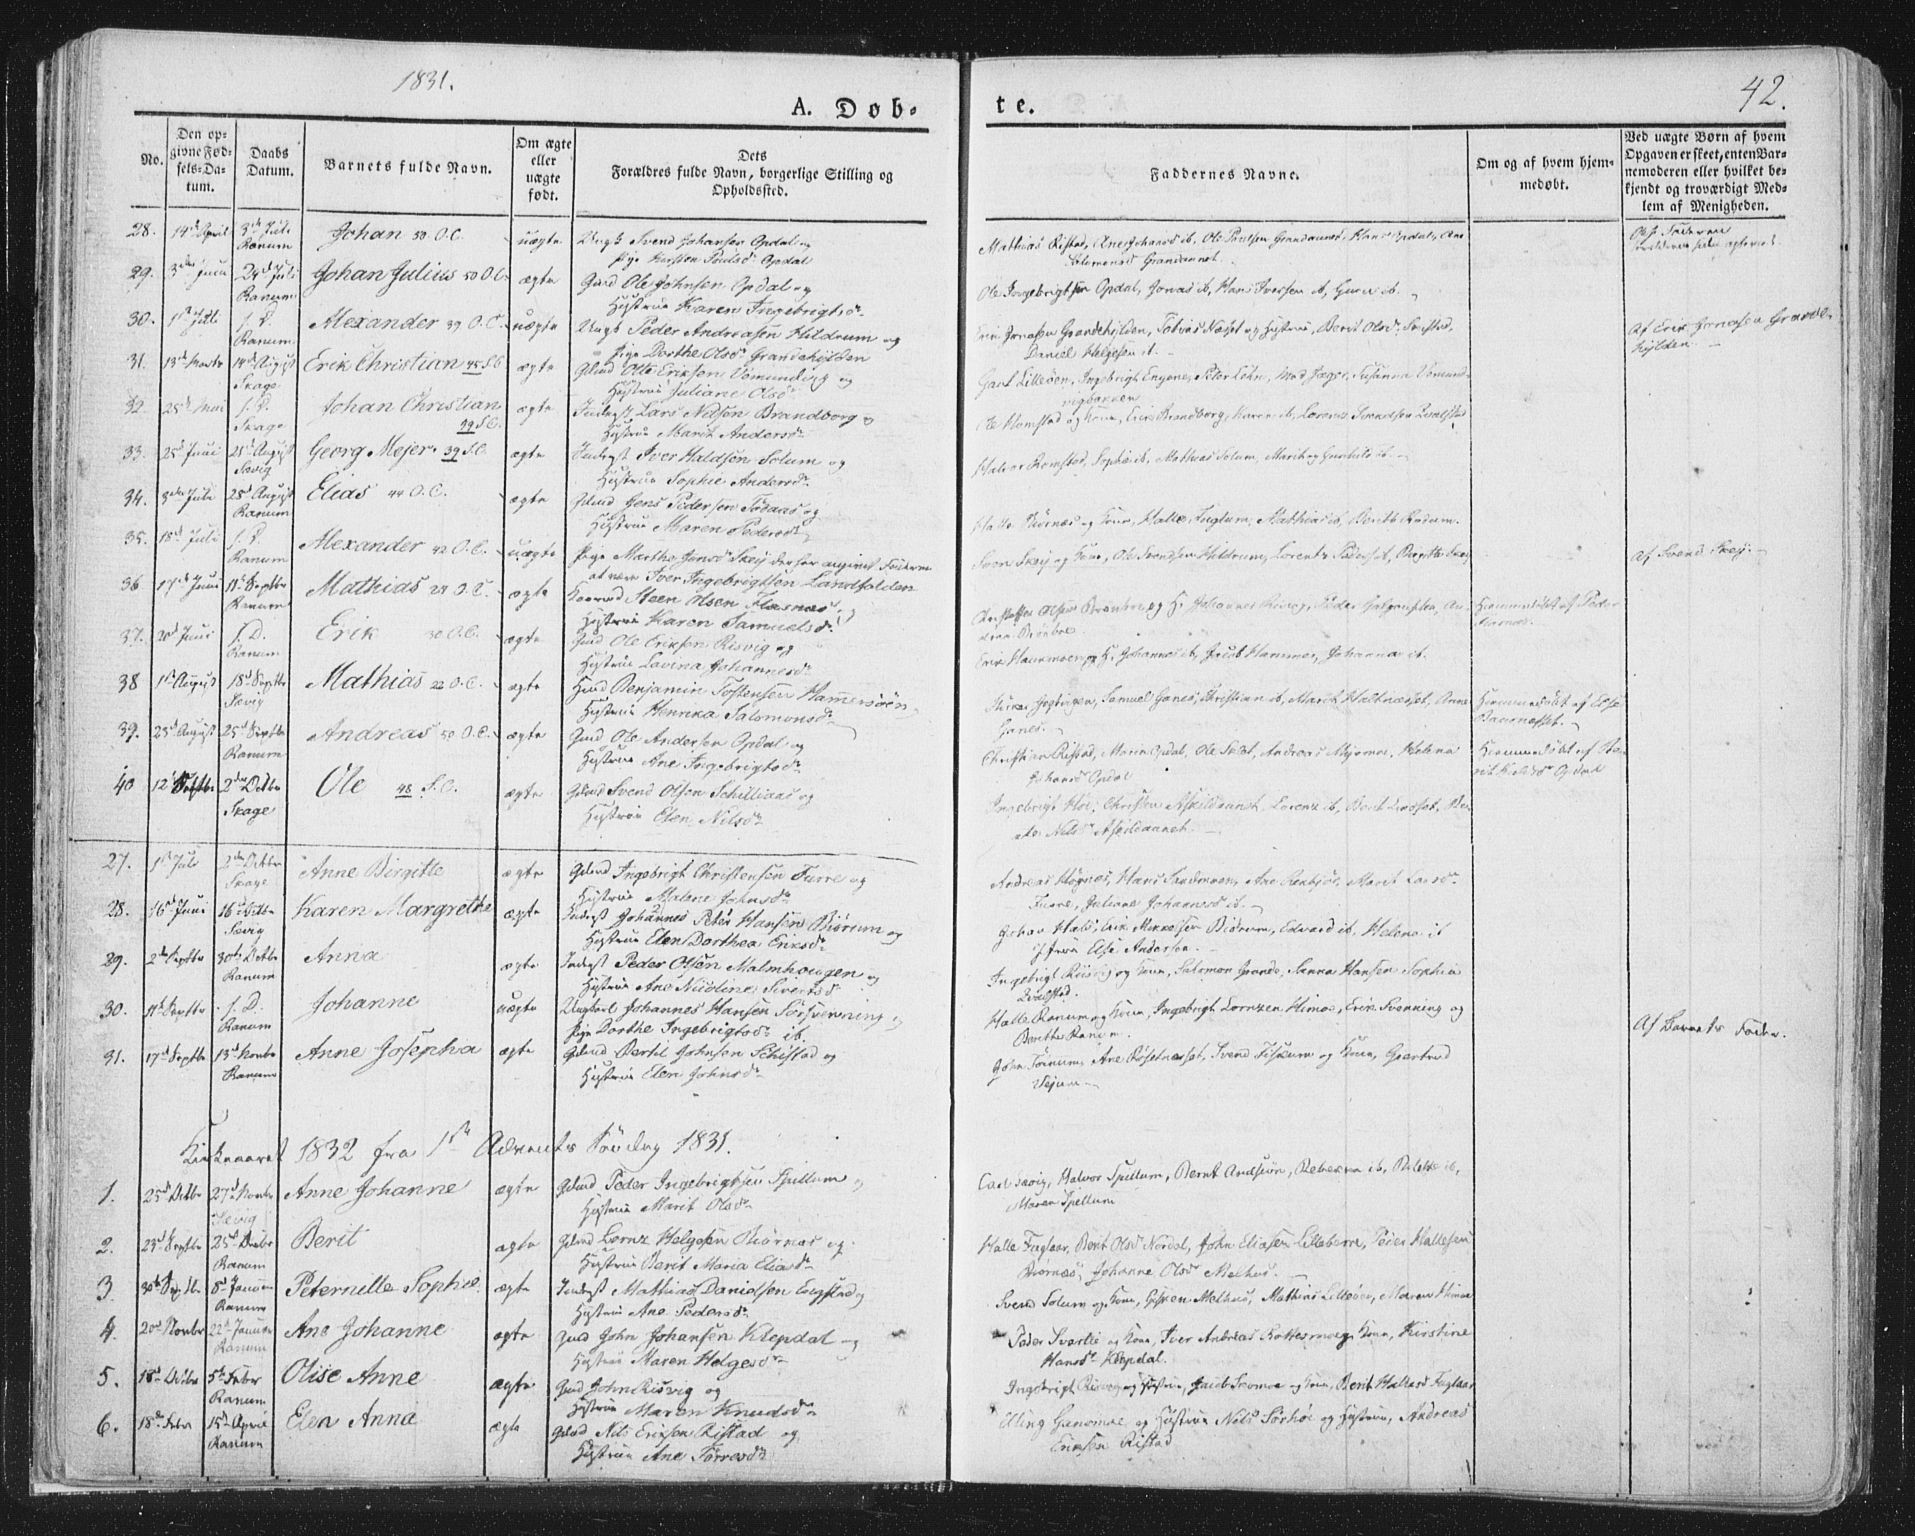 SAT, Ministerialprotokoller, klokkerbøker og fødselsregistre - Nord-Trøndelag, 764/L0551: Ministerialbok nr. 764A07a, 1824-1864, s. 42